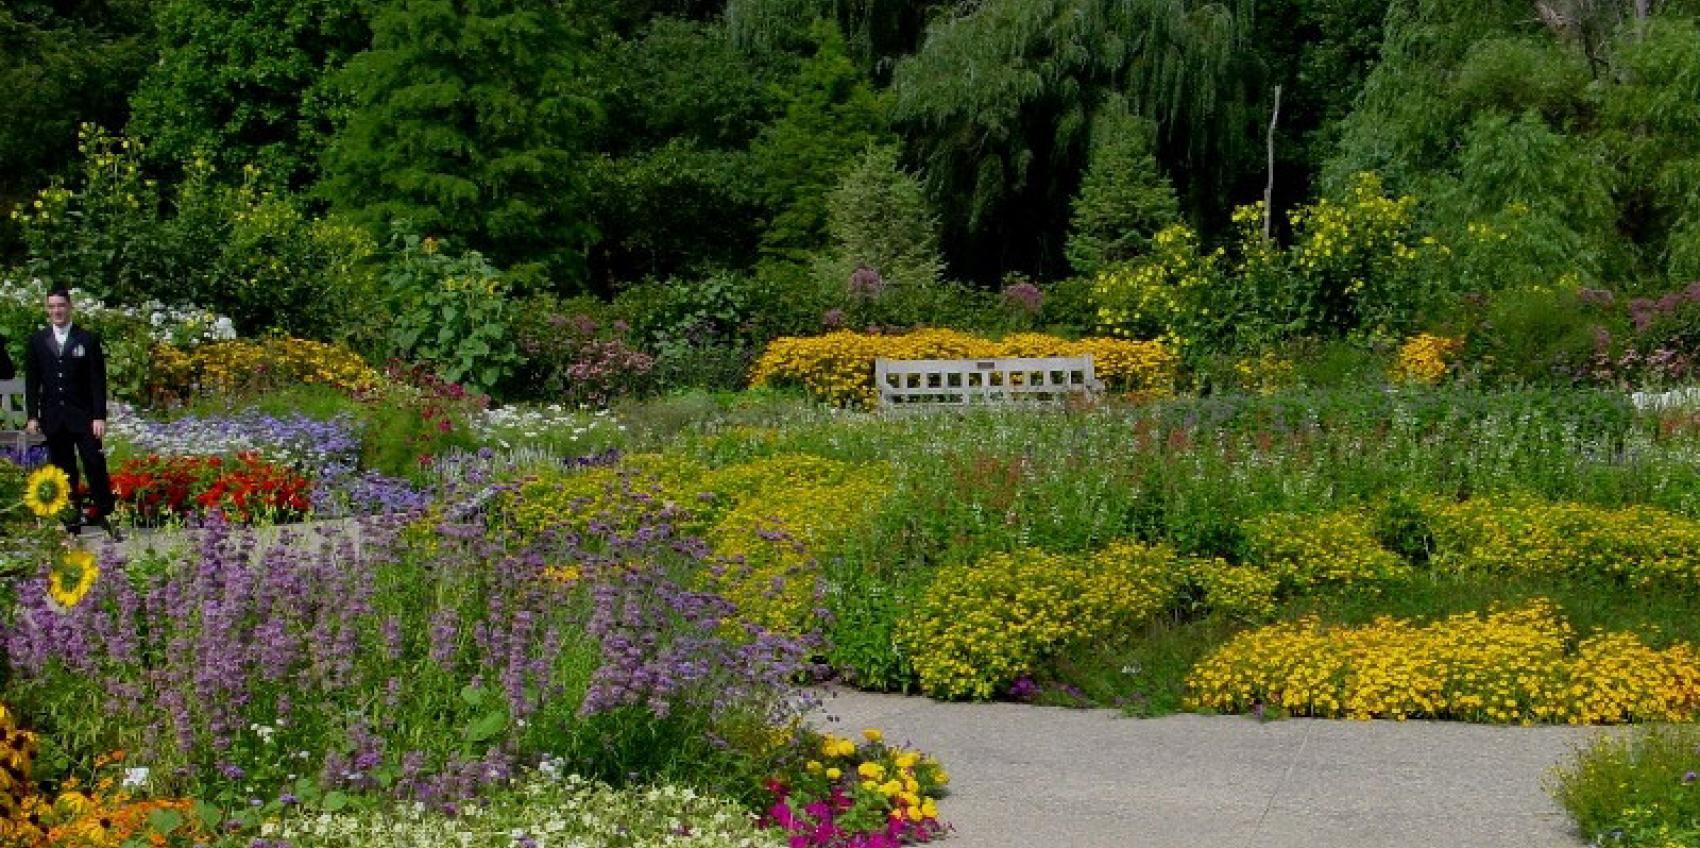 Matthaei botanical gardens nichols arboretum american public gardens association for University of michigan botanical gardens